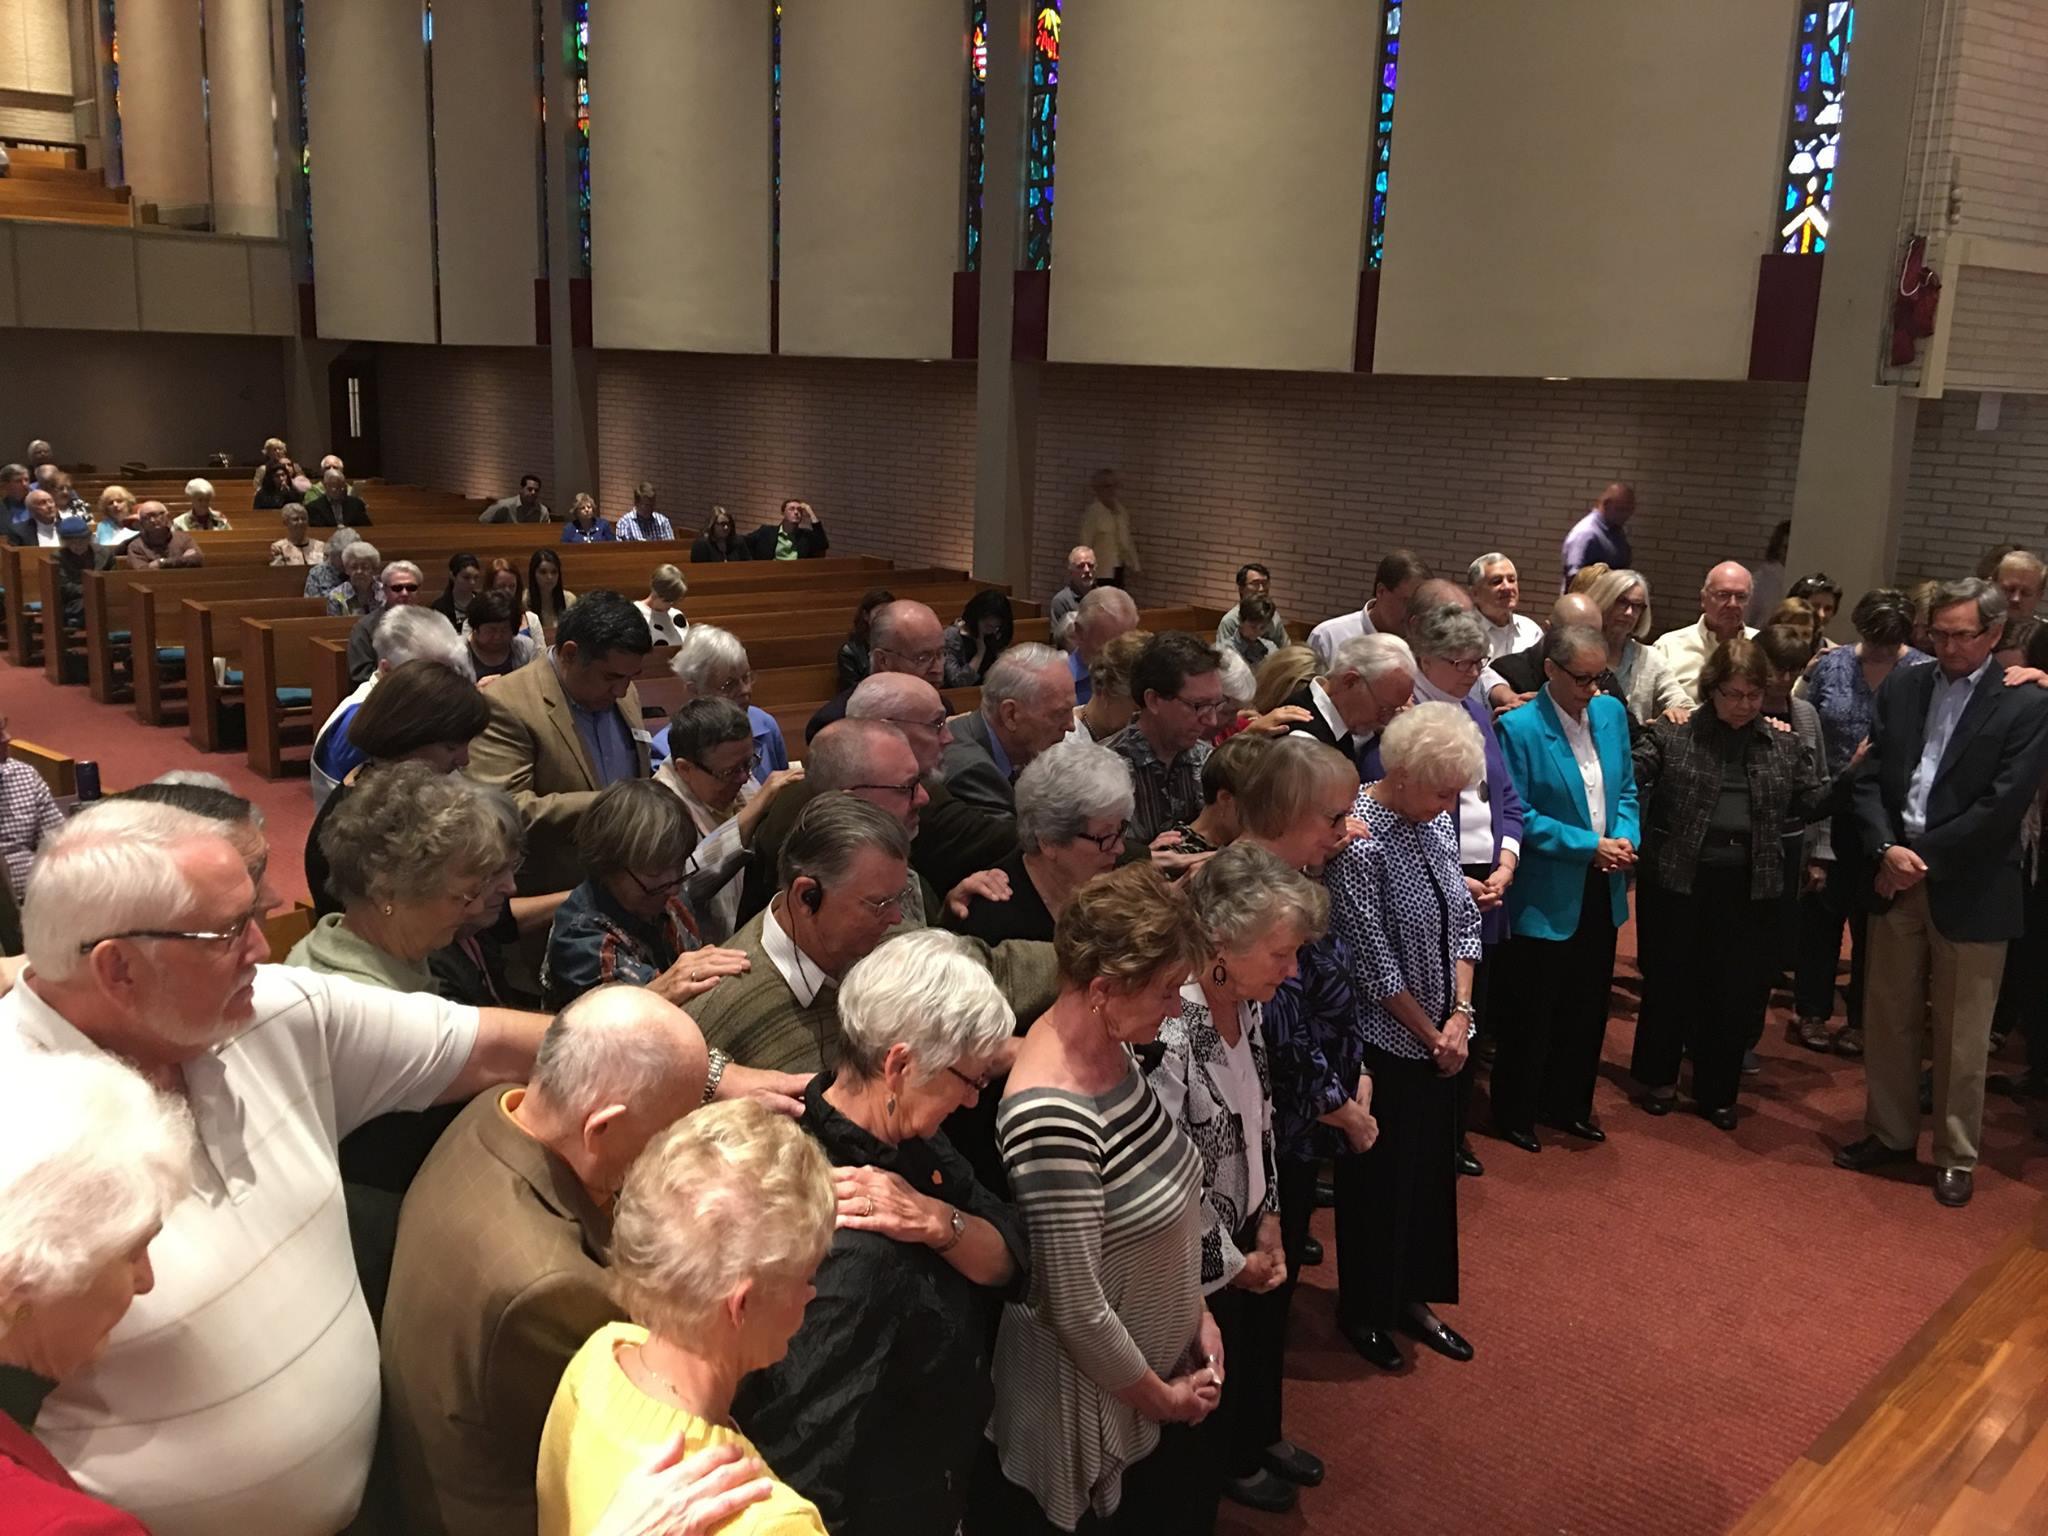 claremont-presbyterian-church-sunday-service-2.jpg